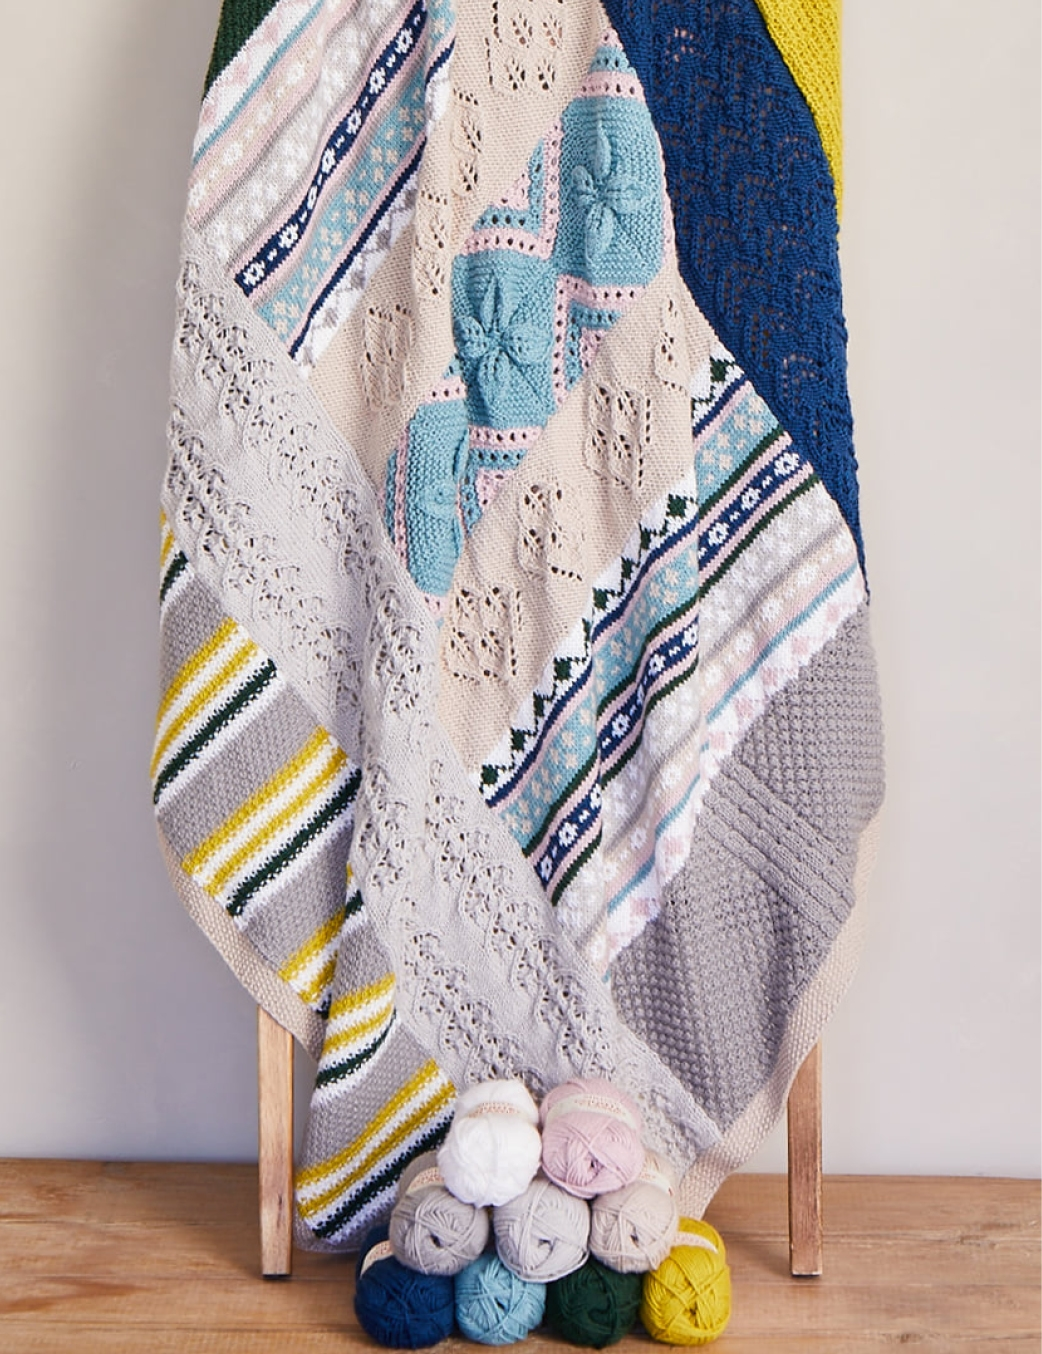 Sirdar Kal No Place Like Home Blanket Nordic Retreat Yarn Pack Wool Warehouse Buy Yarn Wool Needles Other Knitting Supplies Online